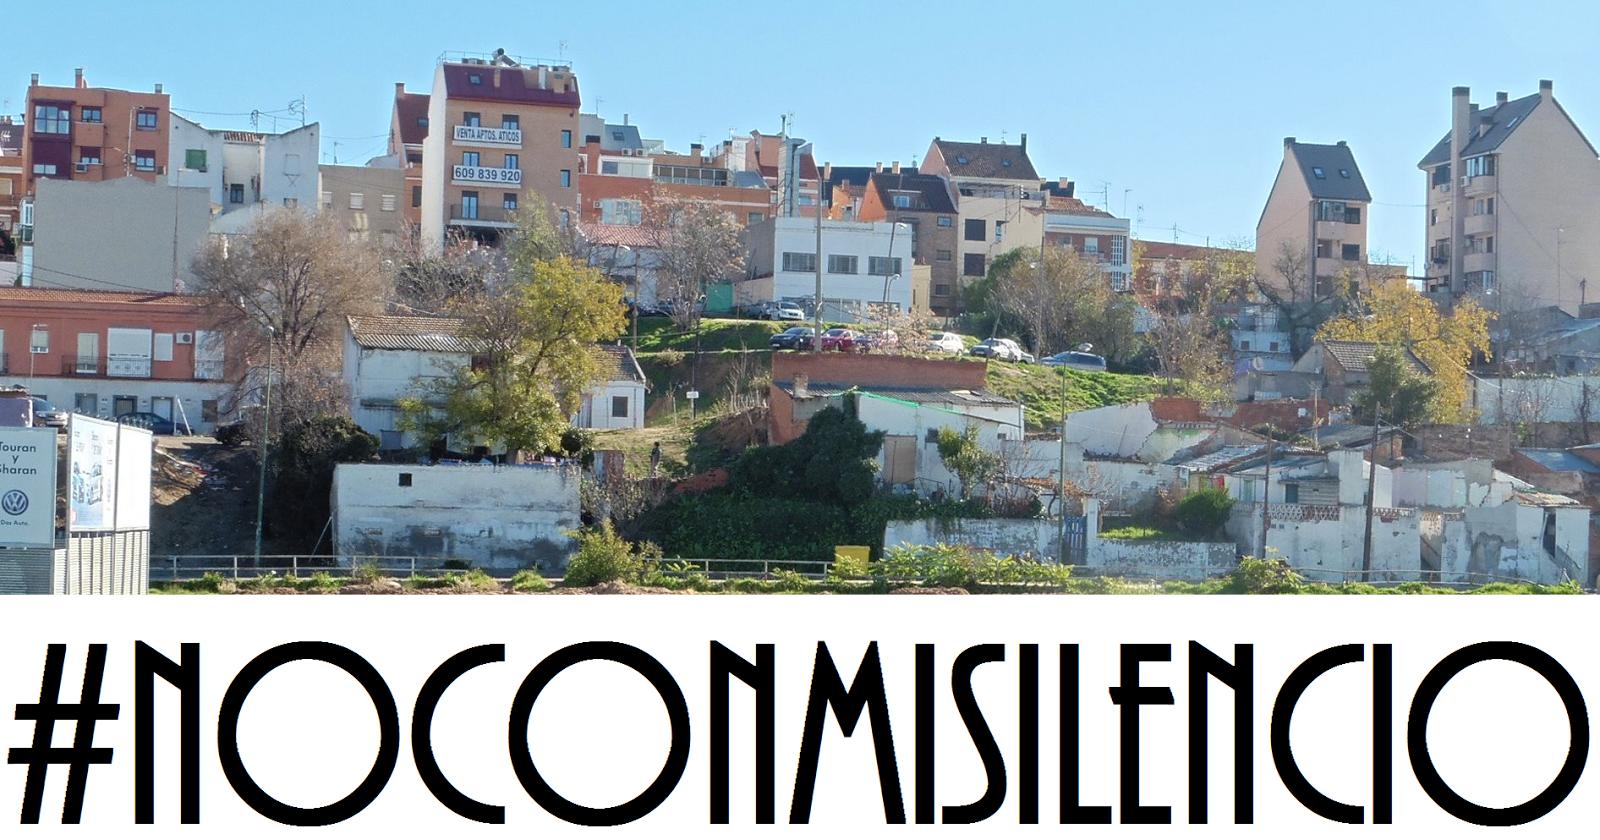 http://avccaminostetuan.blogspot.com.es/2014/12/archivo-digital-paseo-de-la-direccion.html